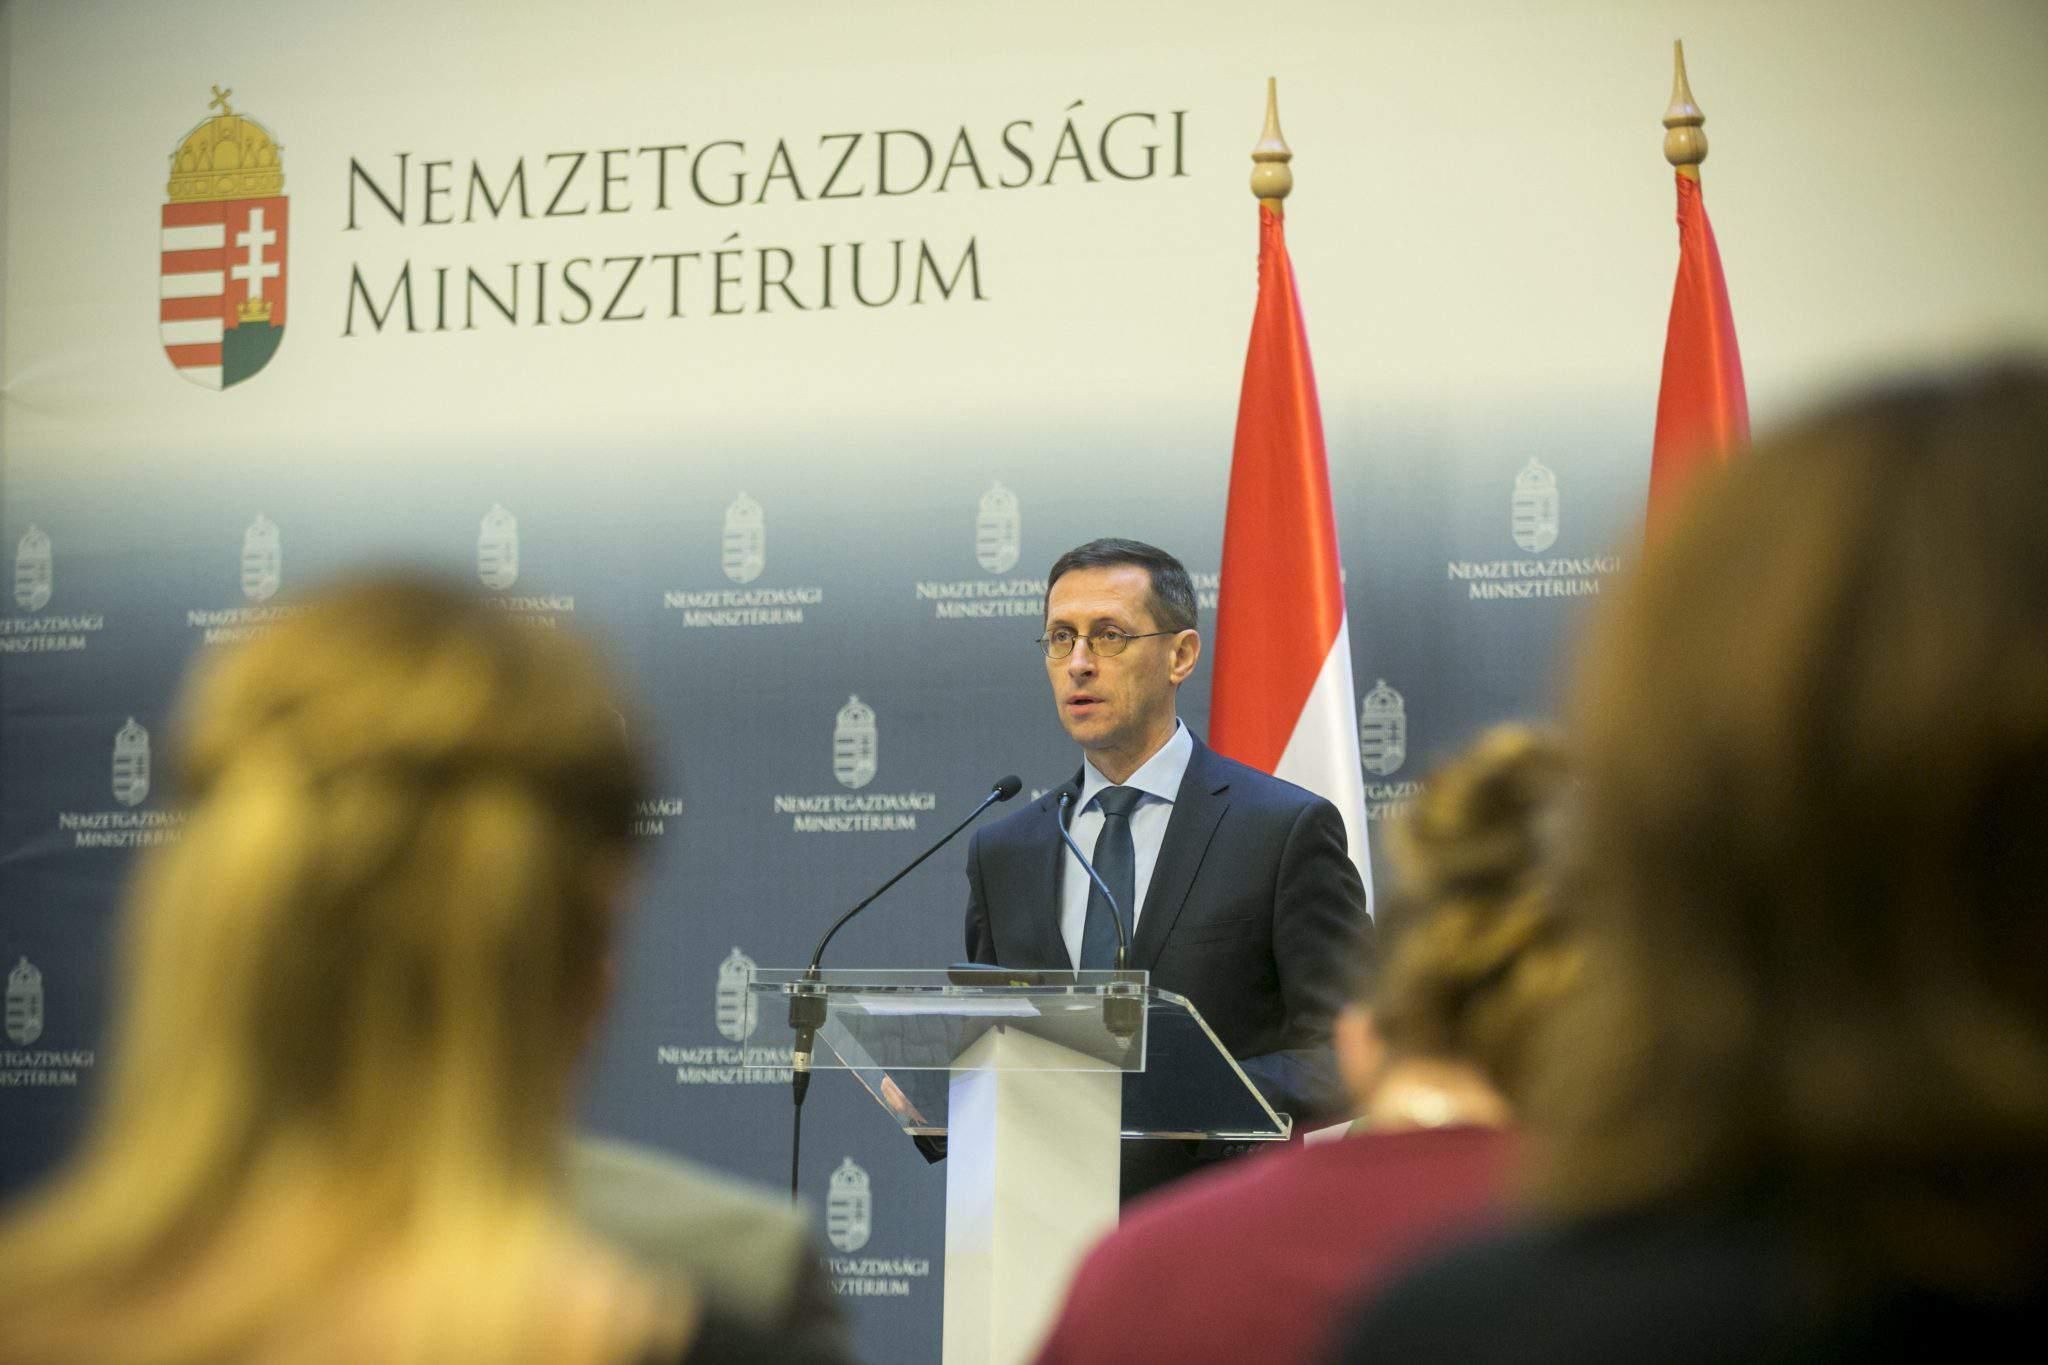 Hungary economy minister Varga